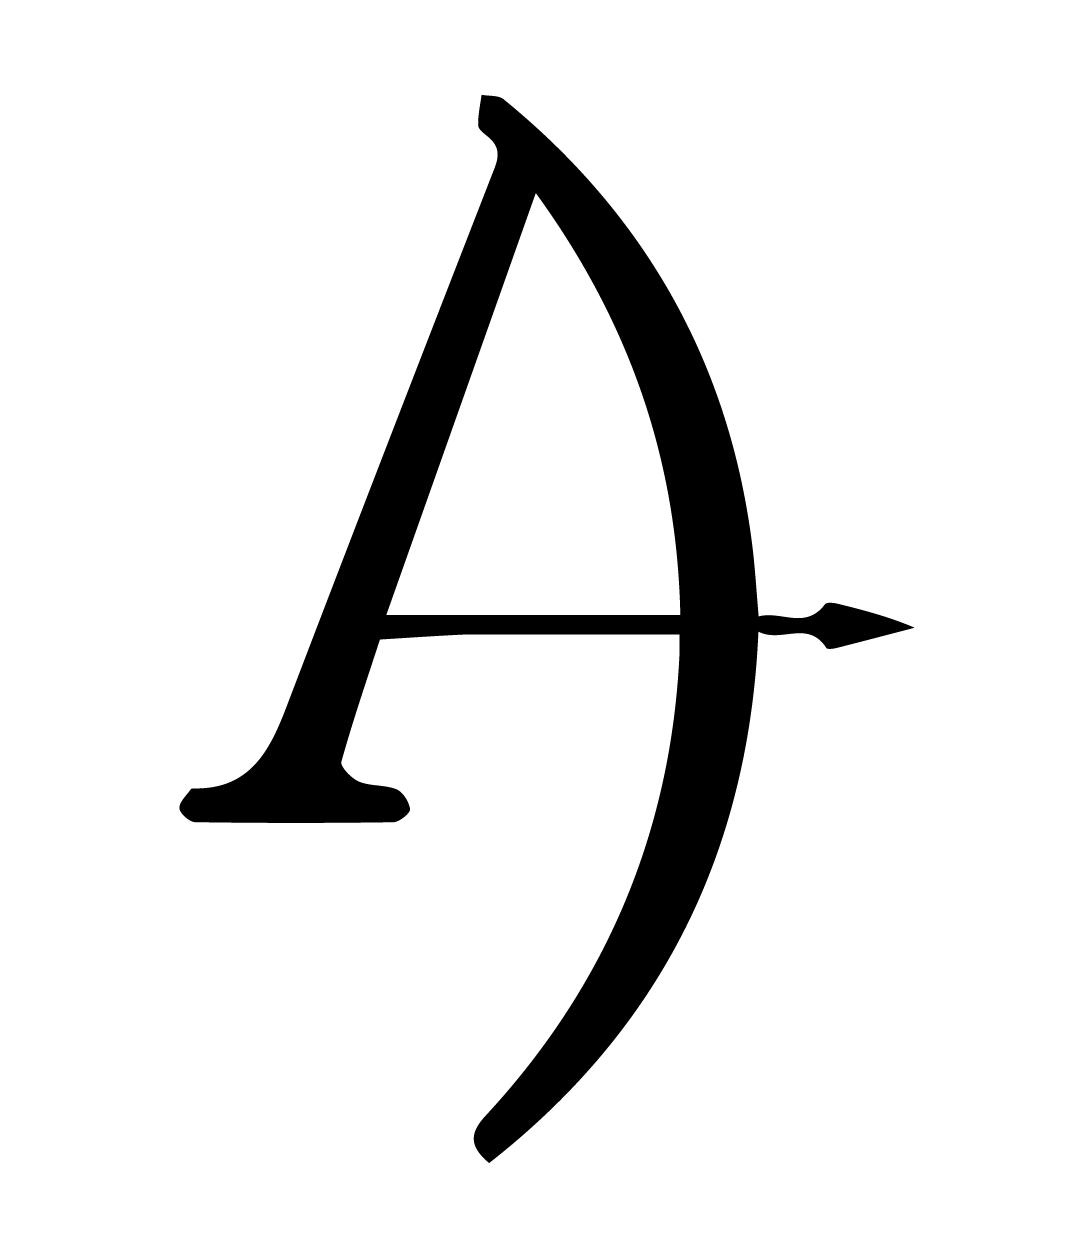 Artemis greek goddess symbol symbols pinterest artemis and artemis greek goddess symbol biocorpaavc